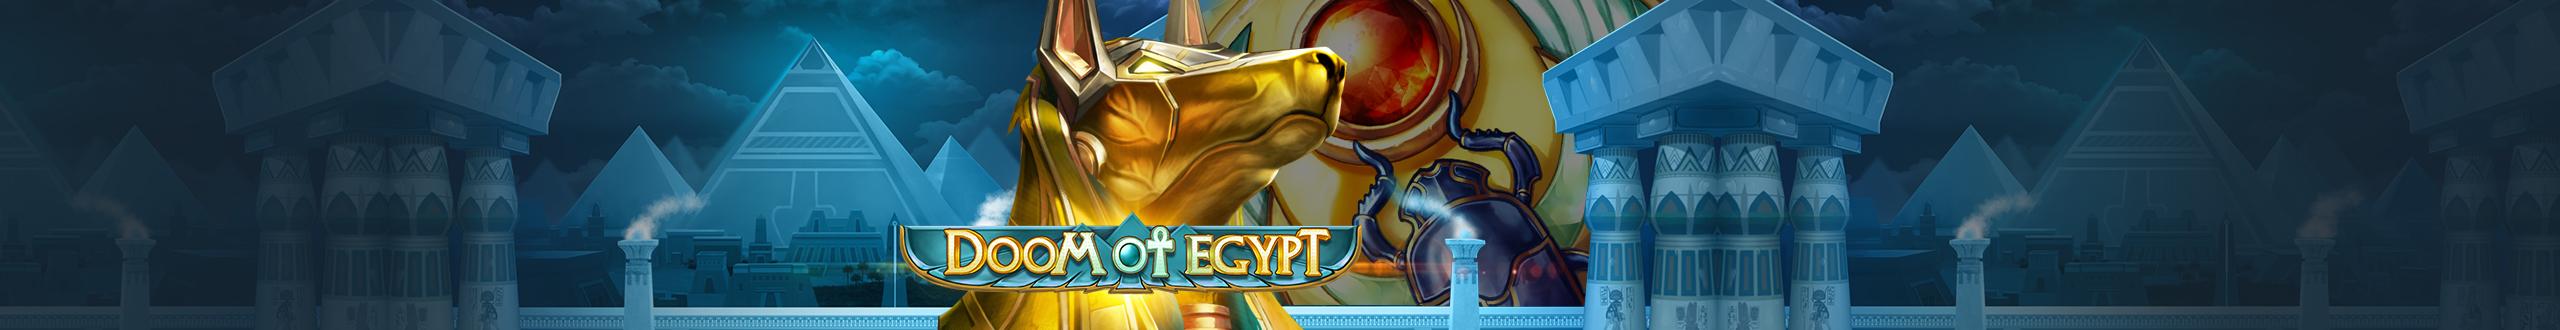 Doom of Egypt!